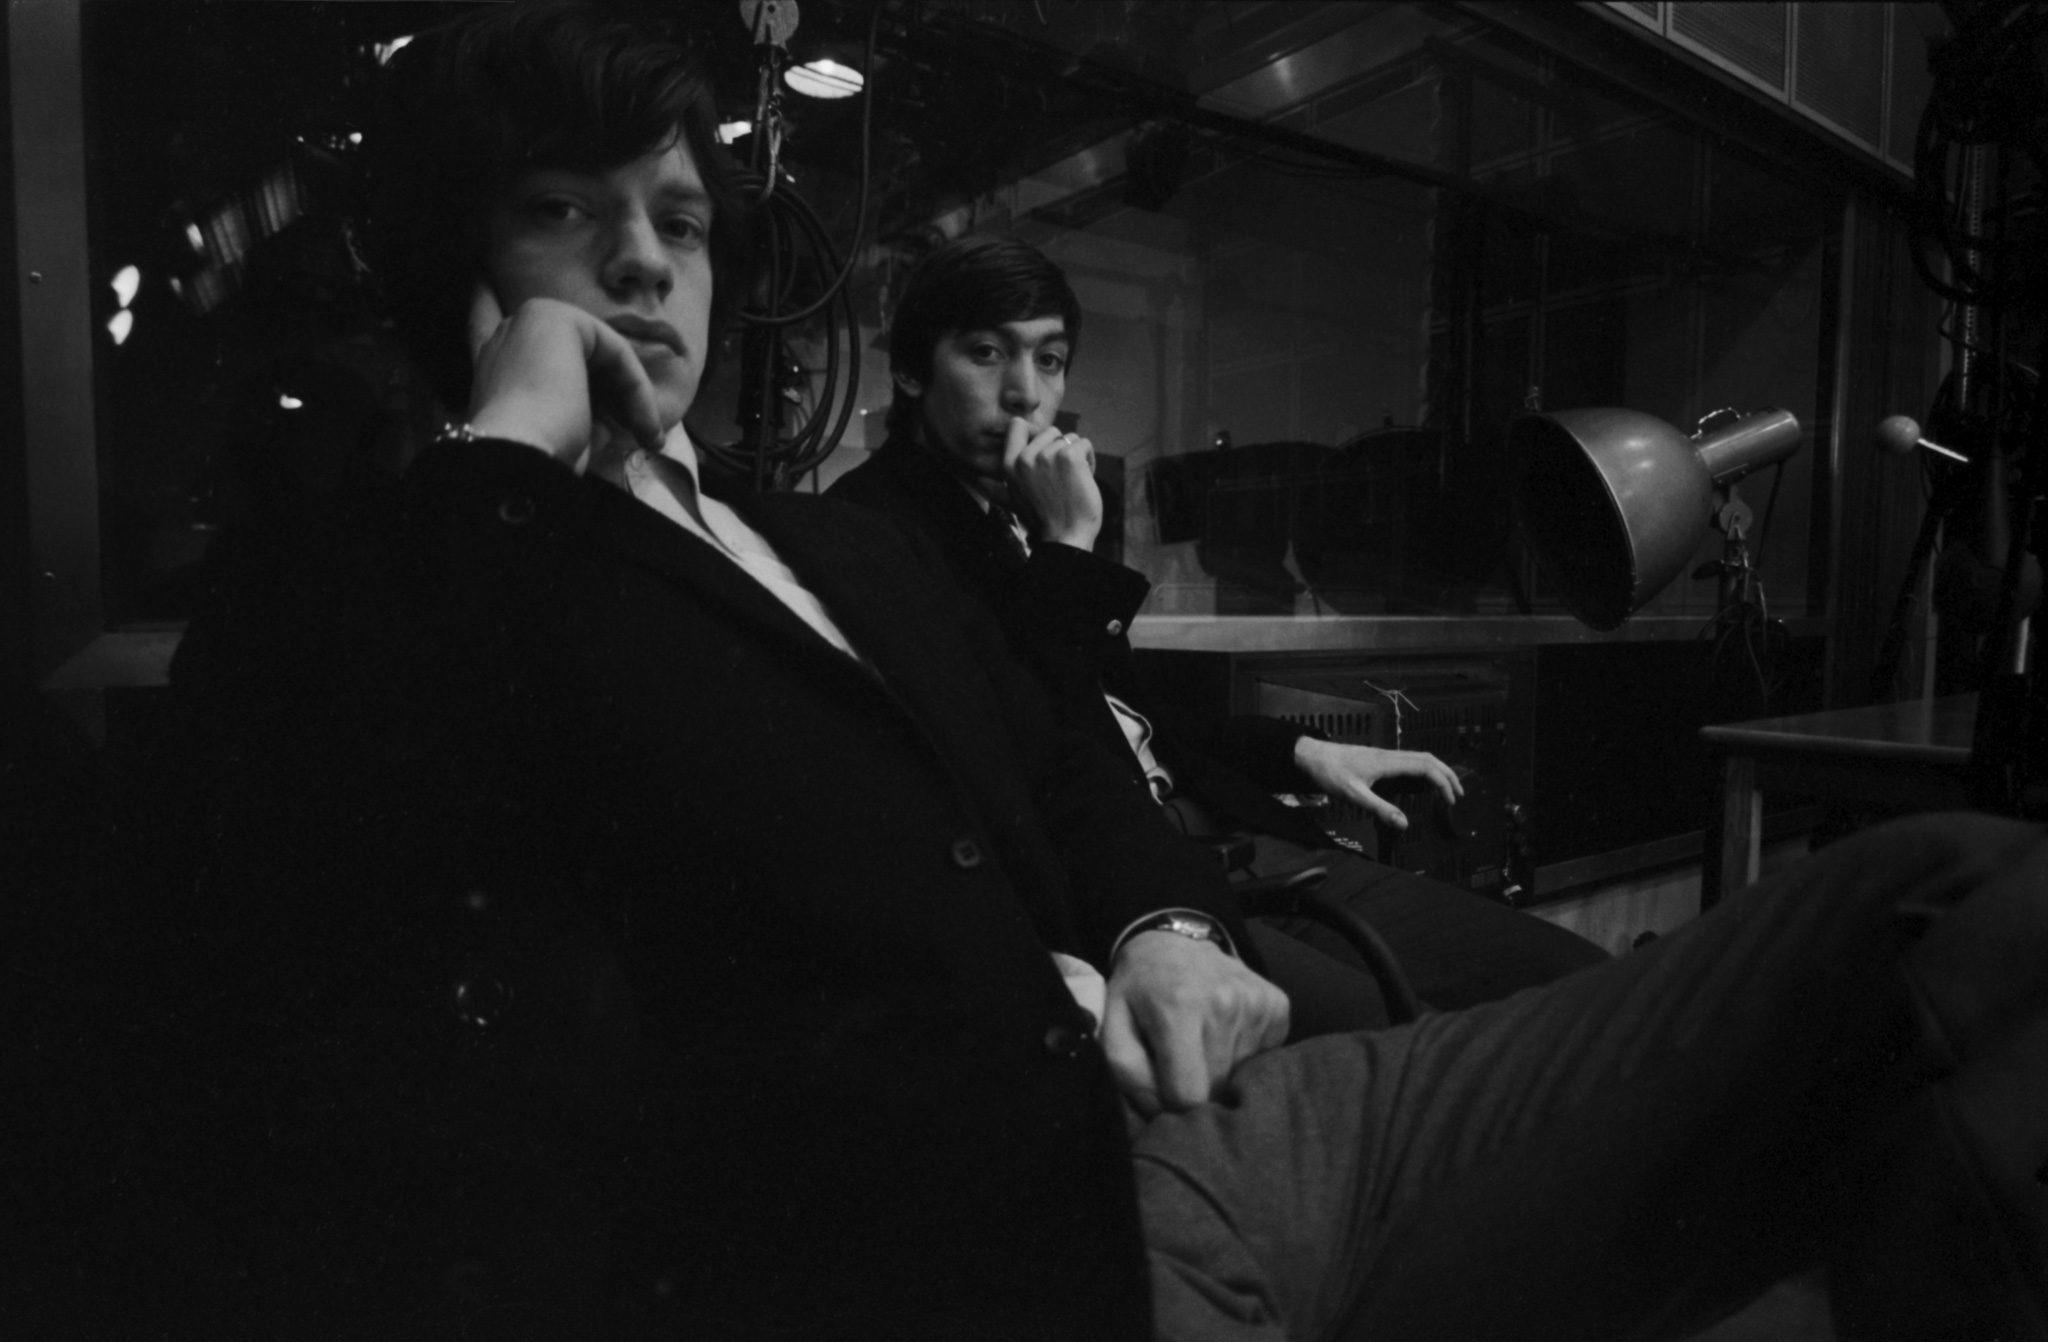 Mick and Charlie